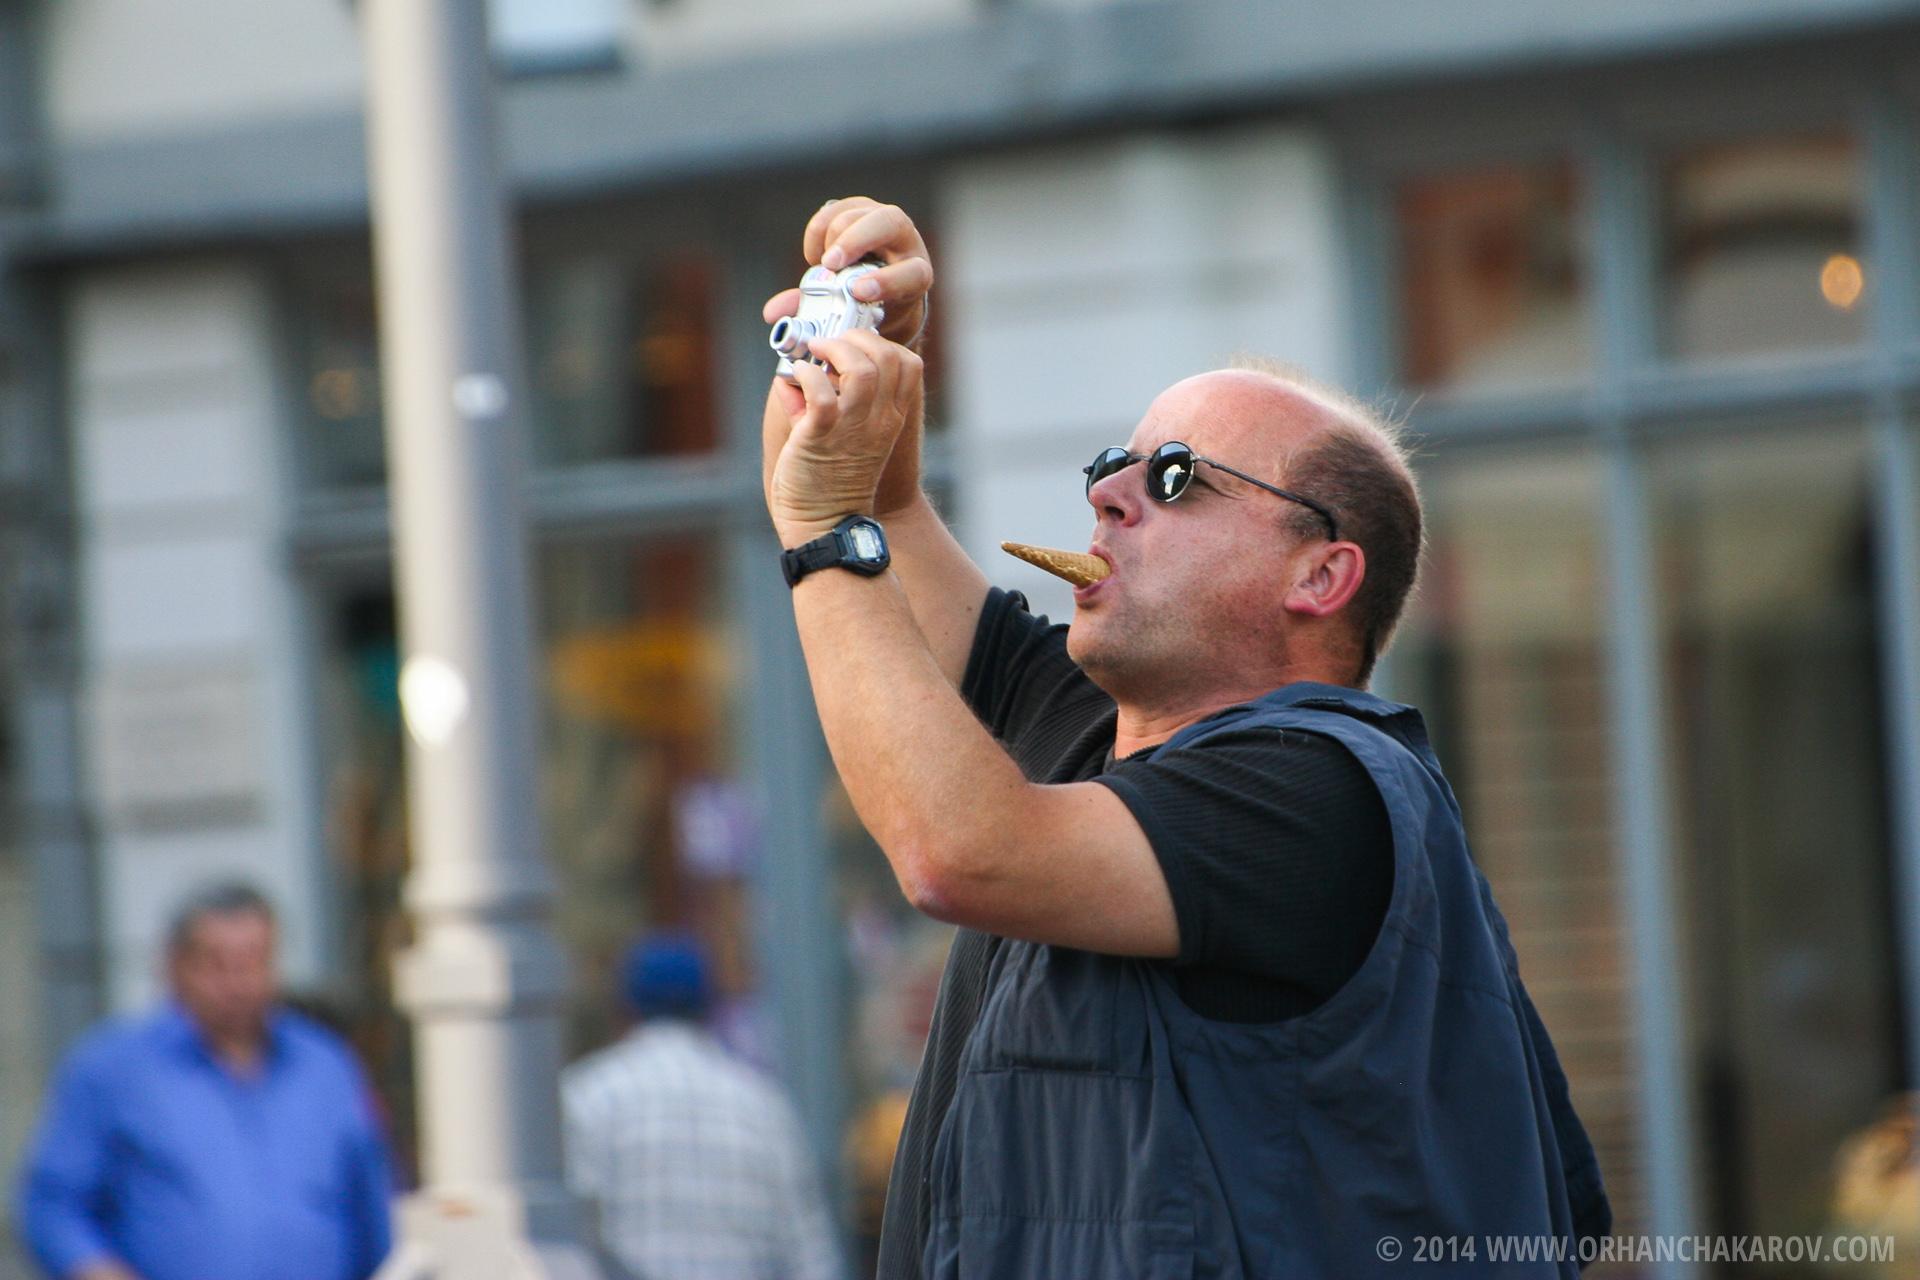 The Ice cream man. Фотограф - Орхан Чакъров, град Варна